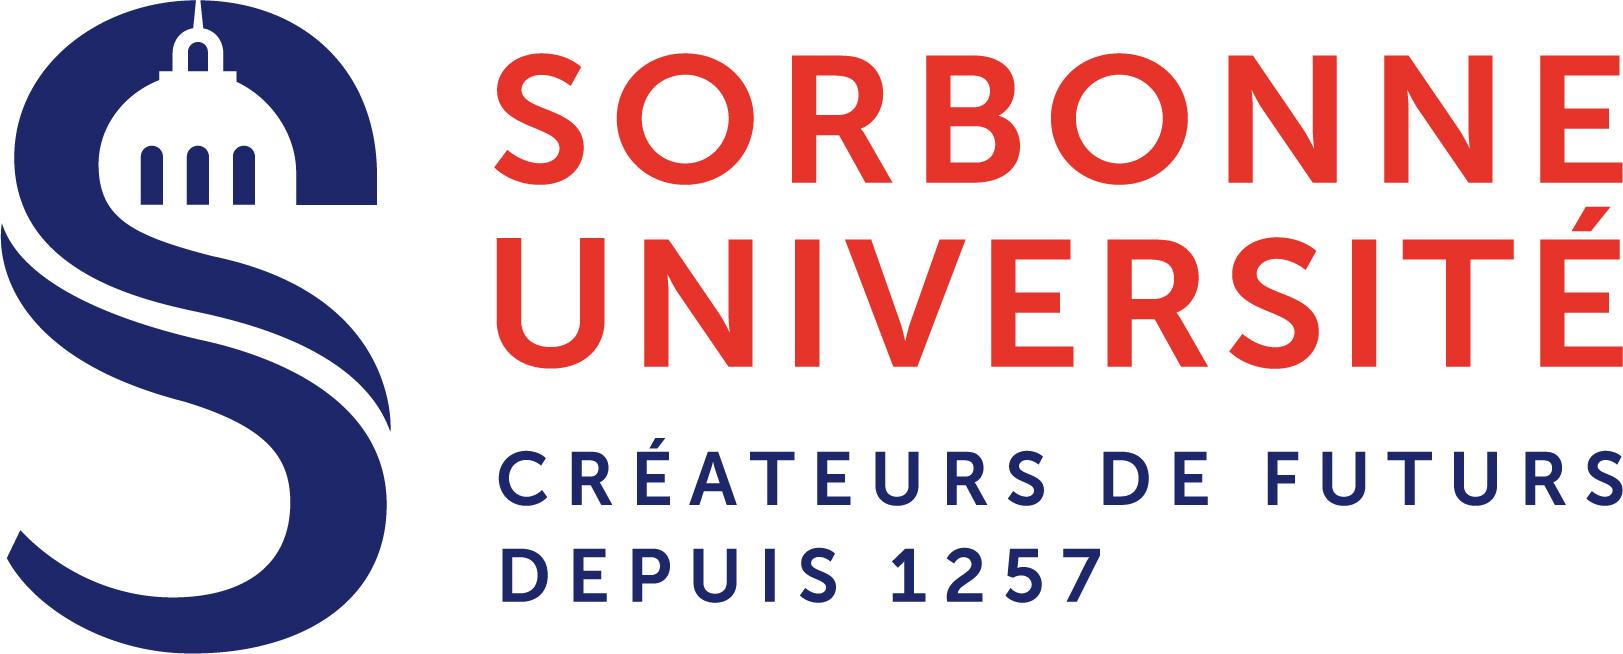 Sorbonne-univ